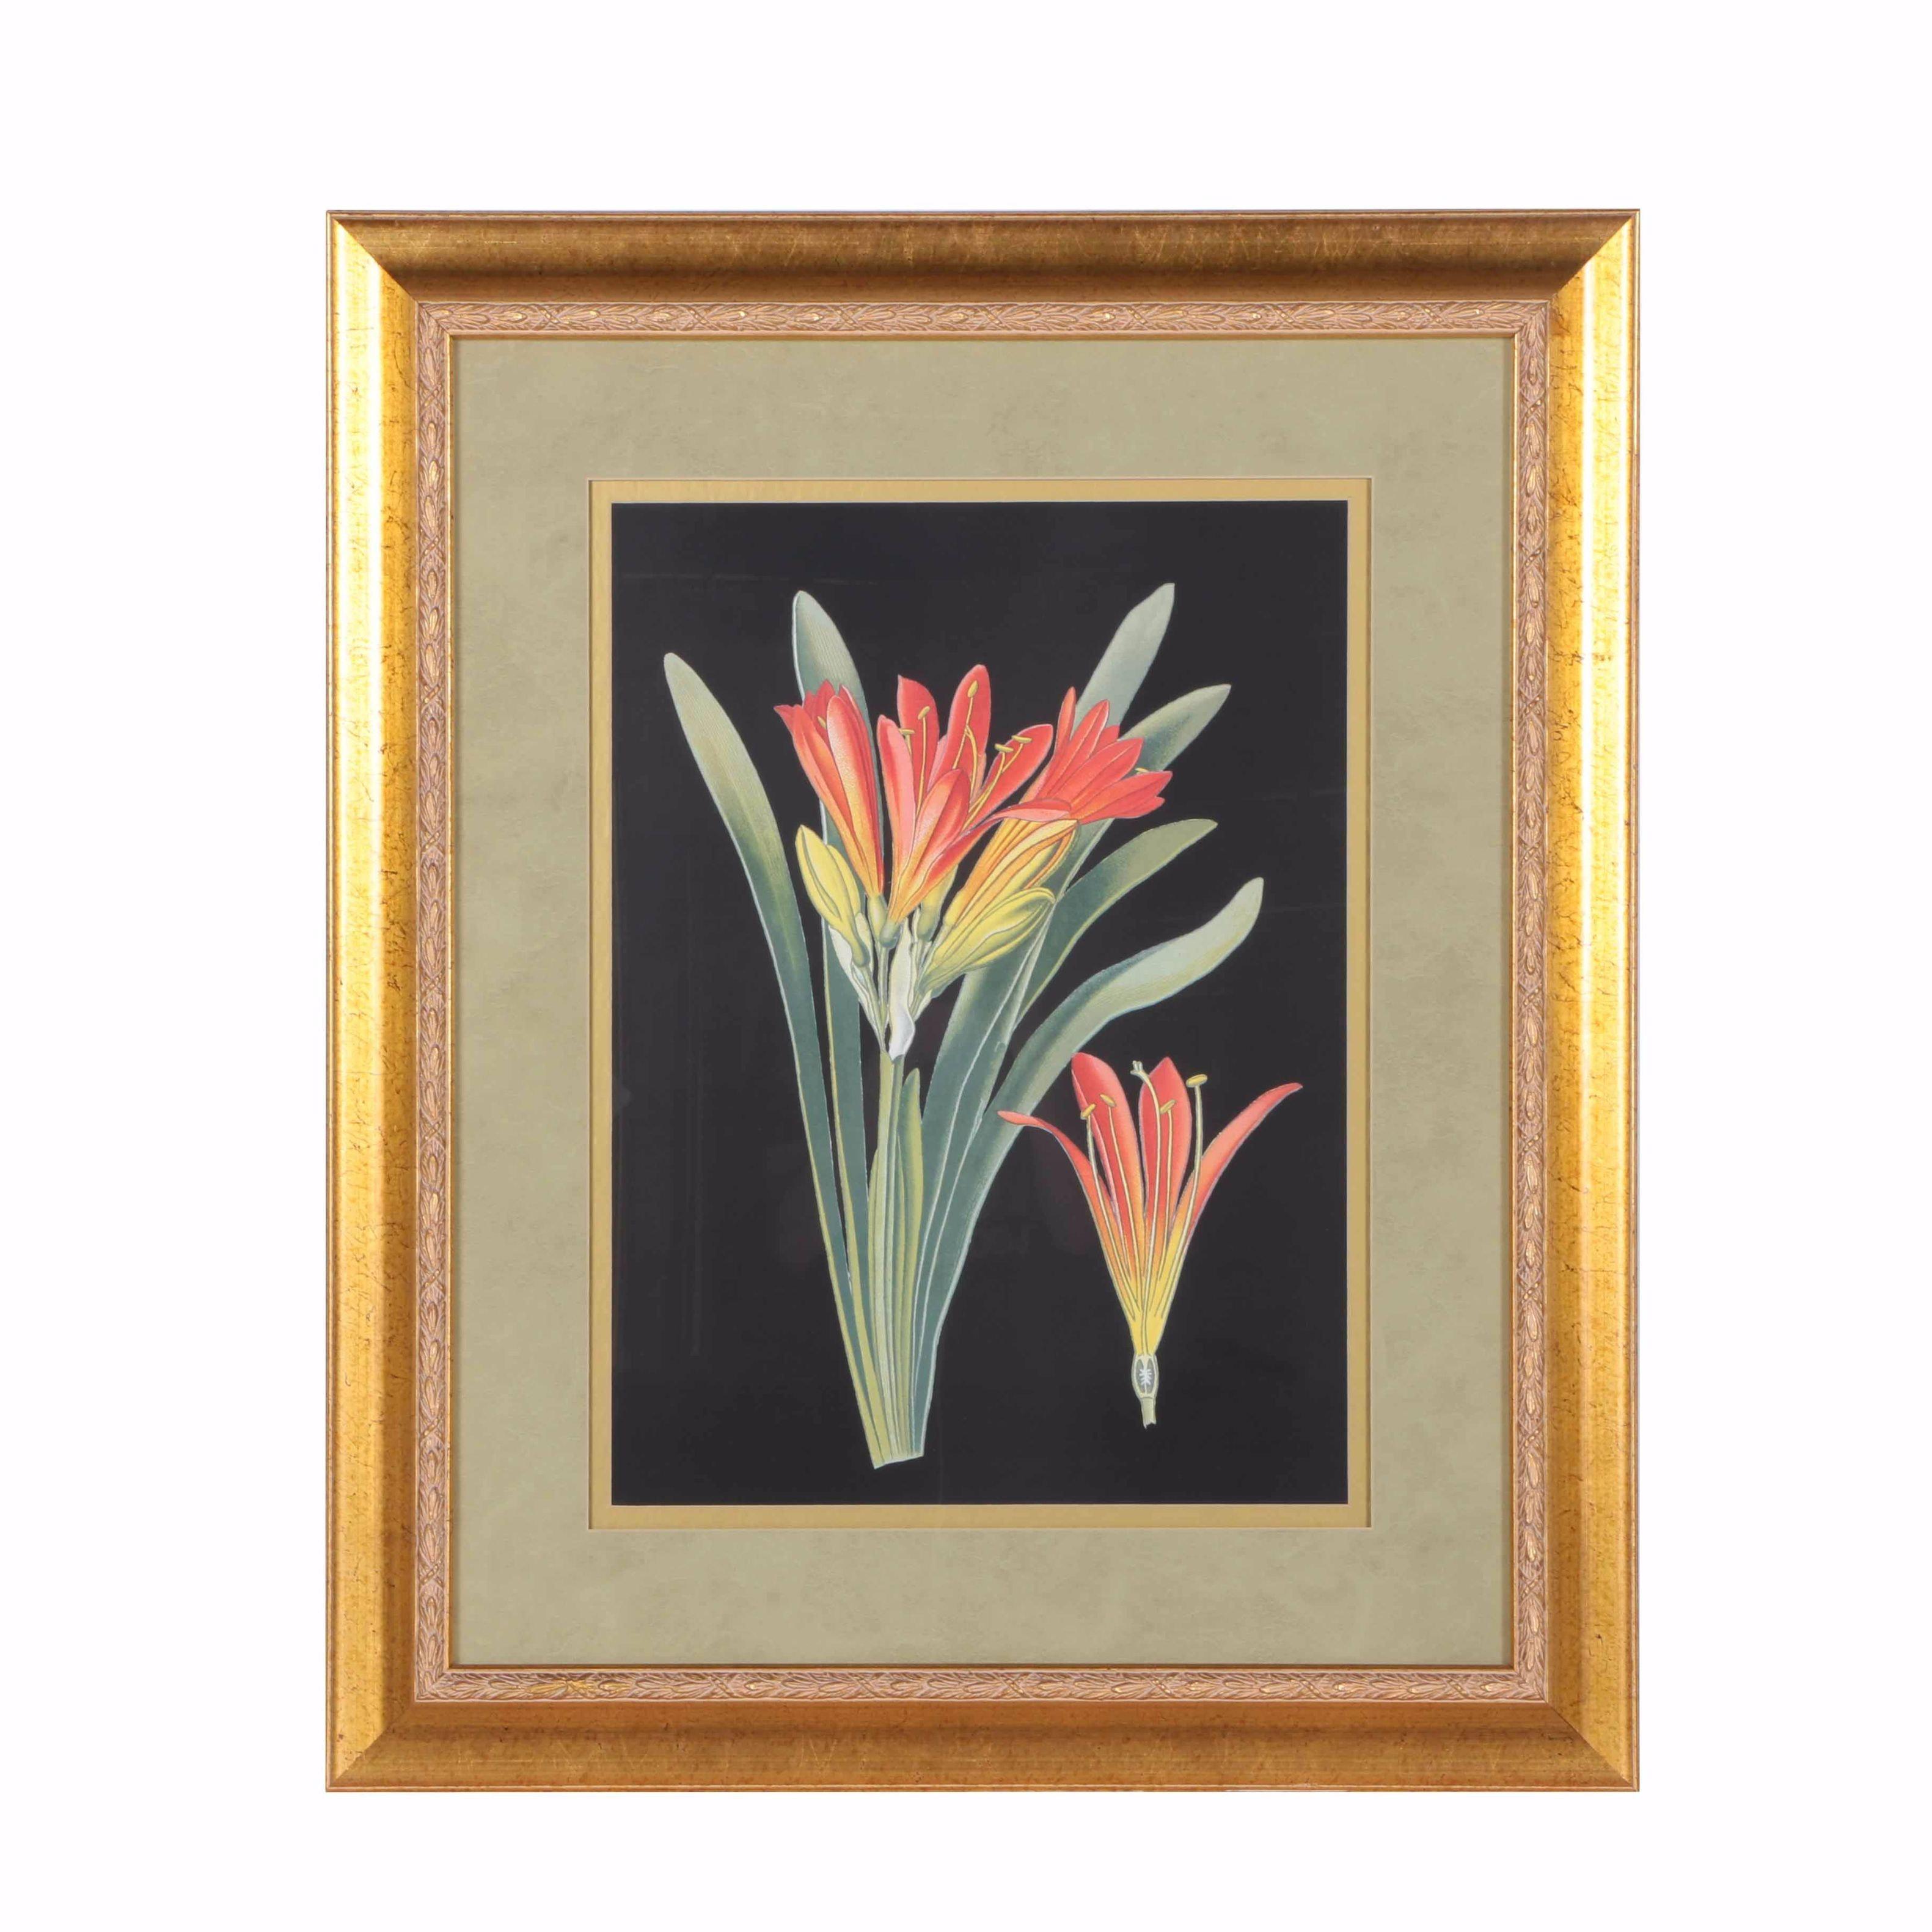 Framed Offset Lithograph Floral Still Life